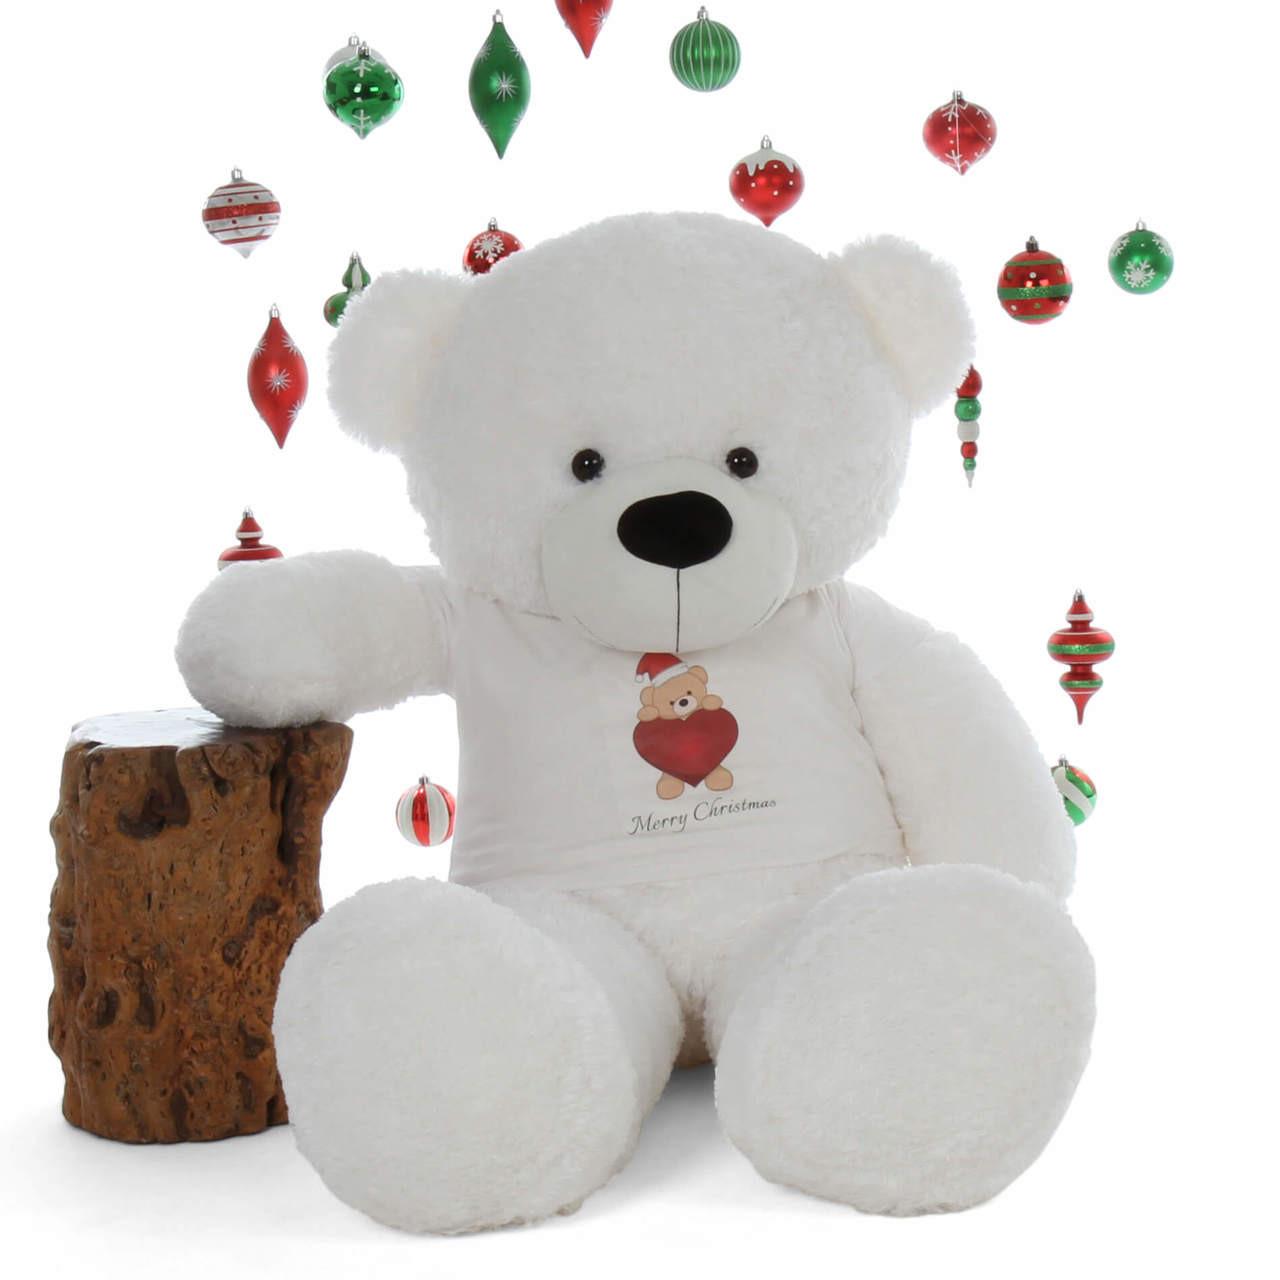 Merry Christmas White Giant Teddy Bear